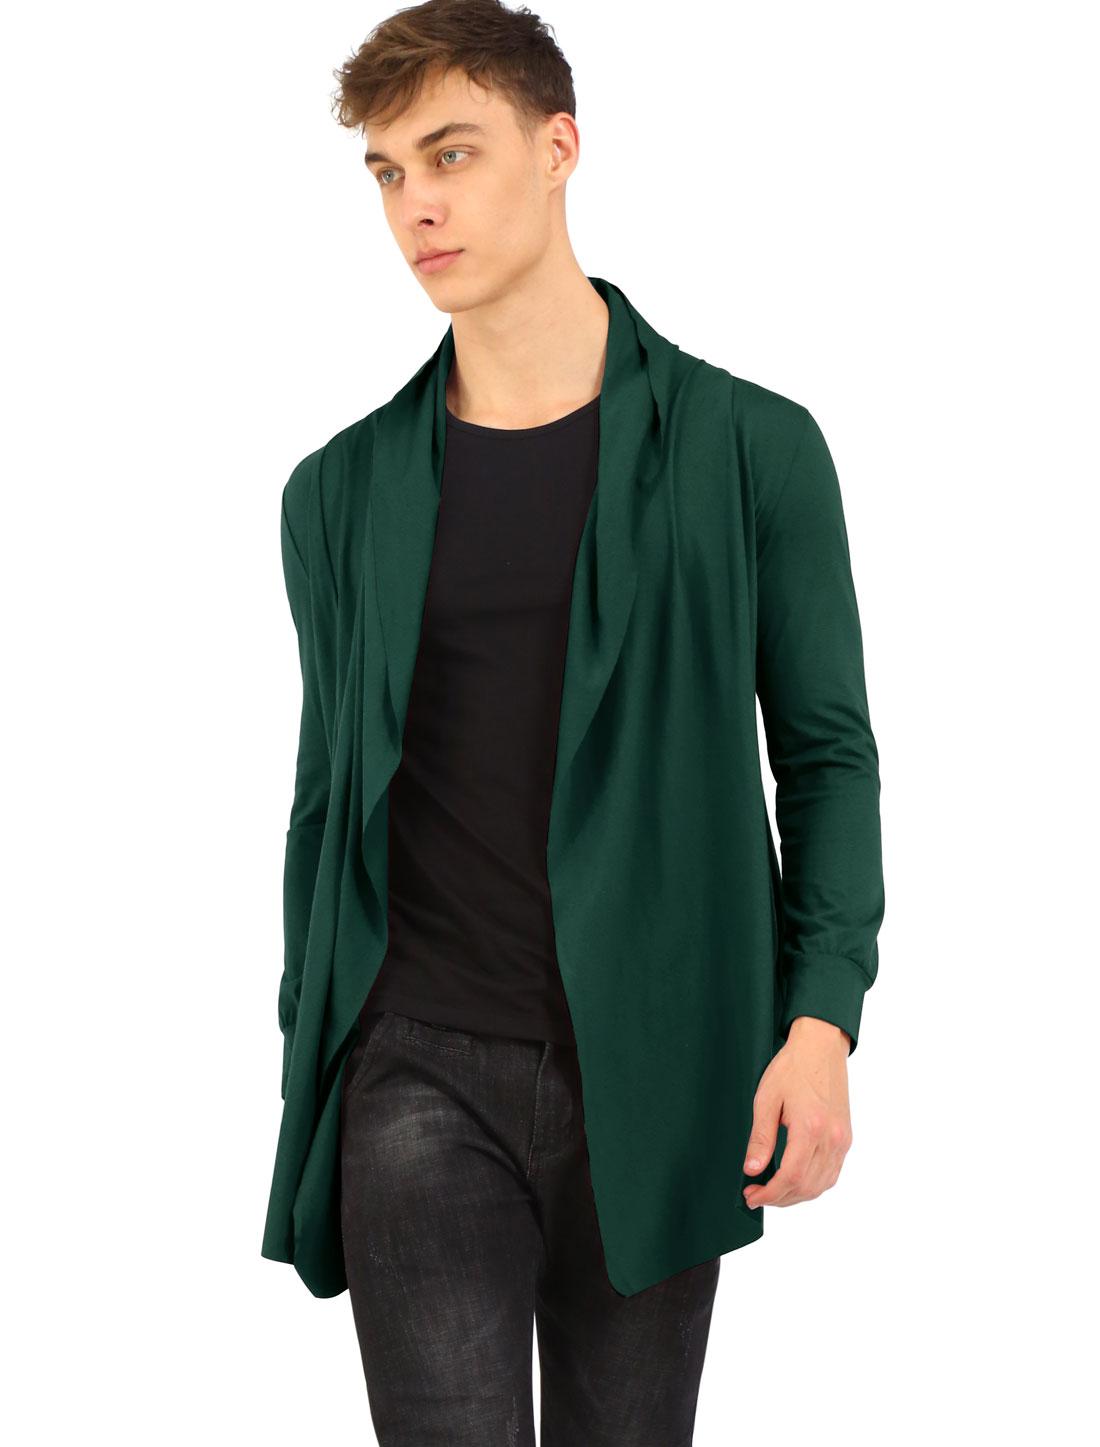 Men Long Sleeves Pockets Front High-Low Hem Long Cardigan Green S